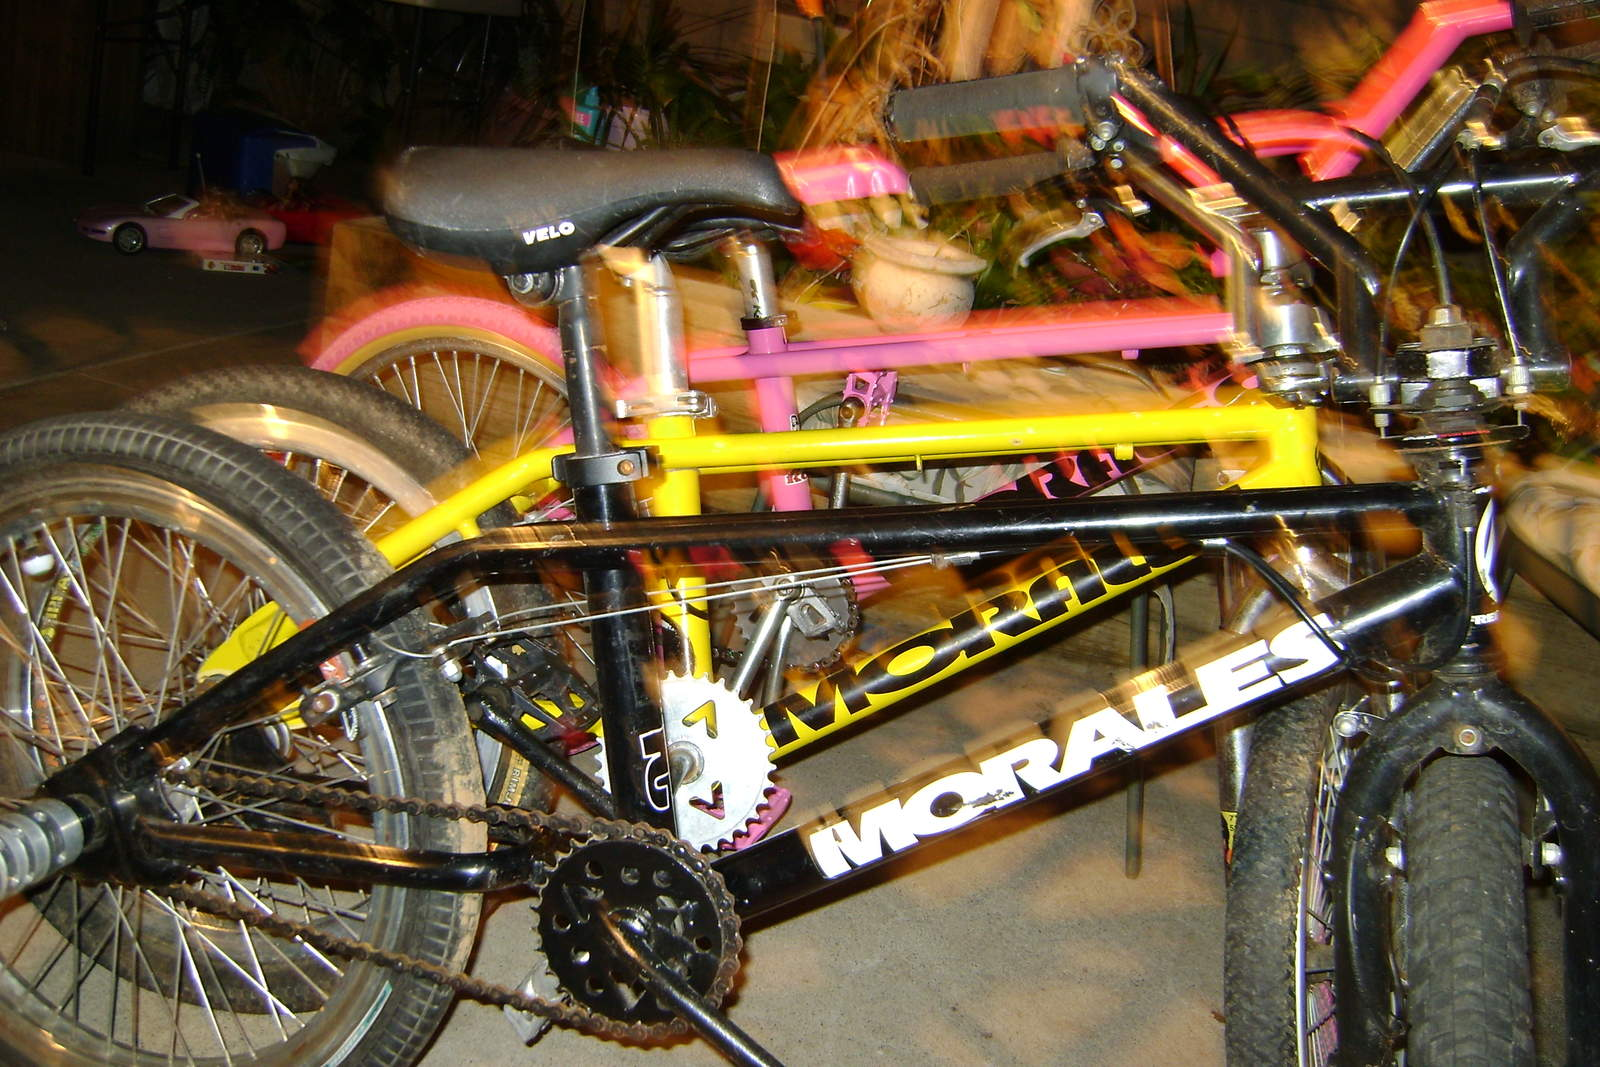 https://s3.amazonaws.com/uploads.bmxmuseum.com/user-images/6905/bikes-freestyle-0225968fa8c44.jpg